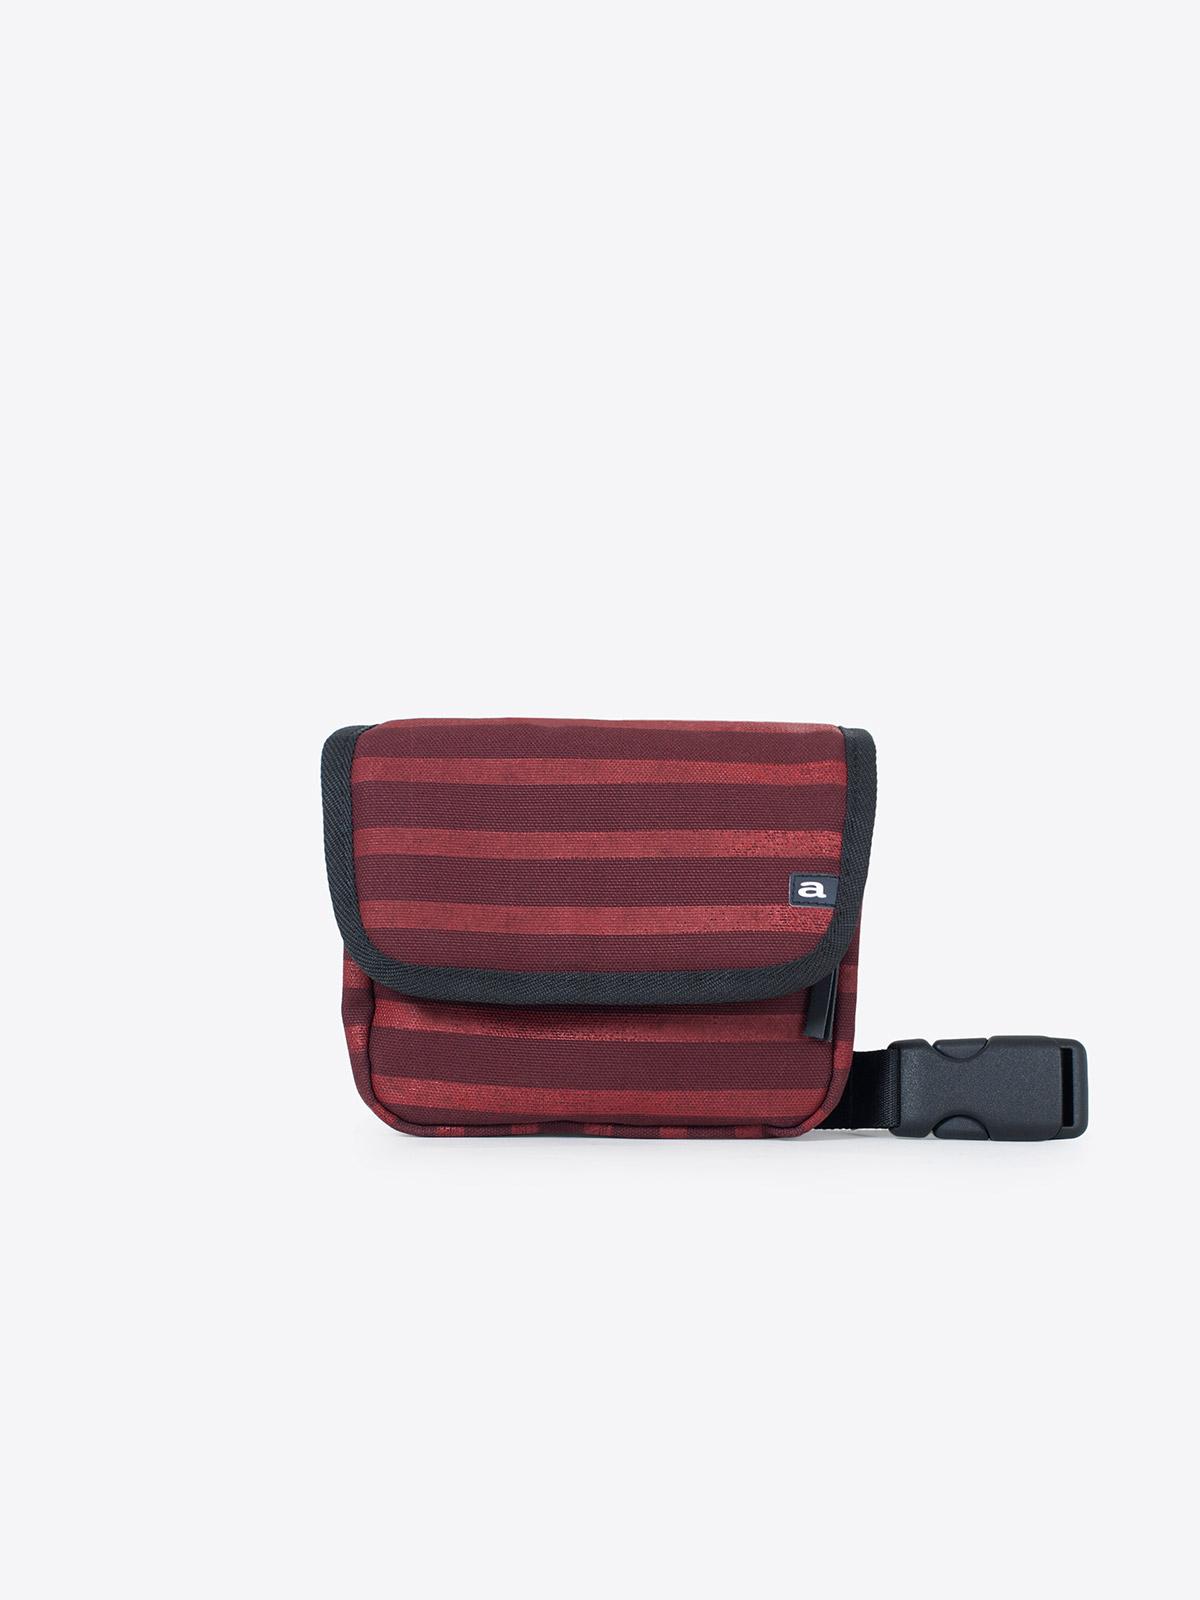 airbag craftworks zip | maritime